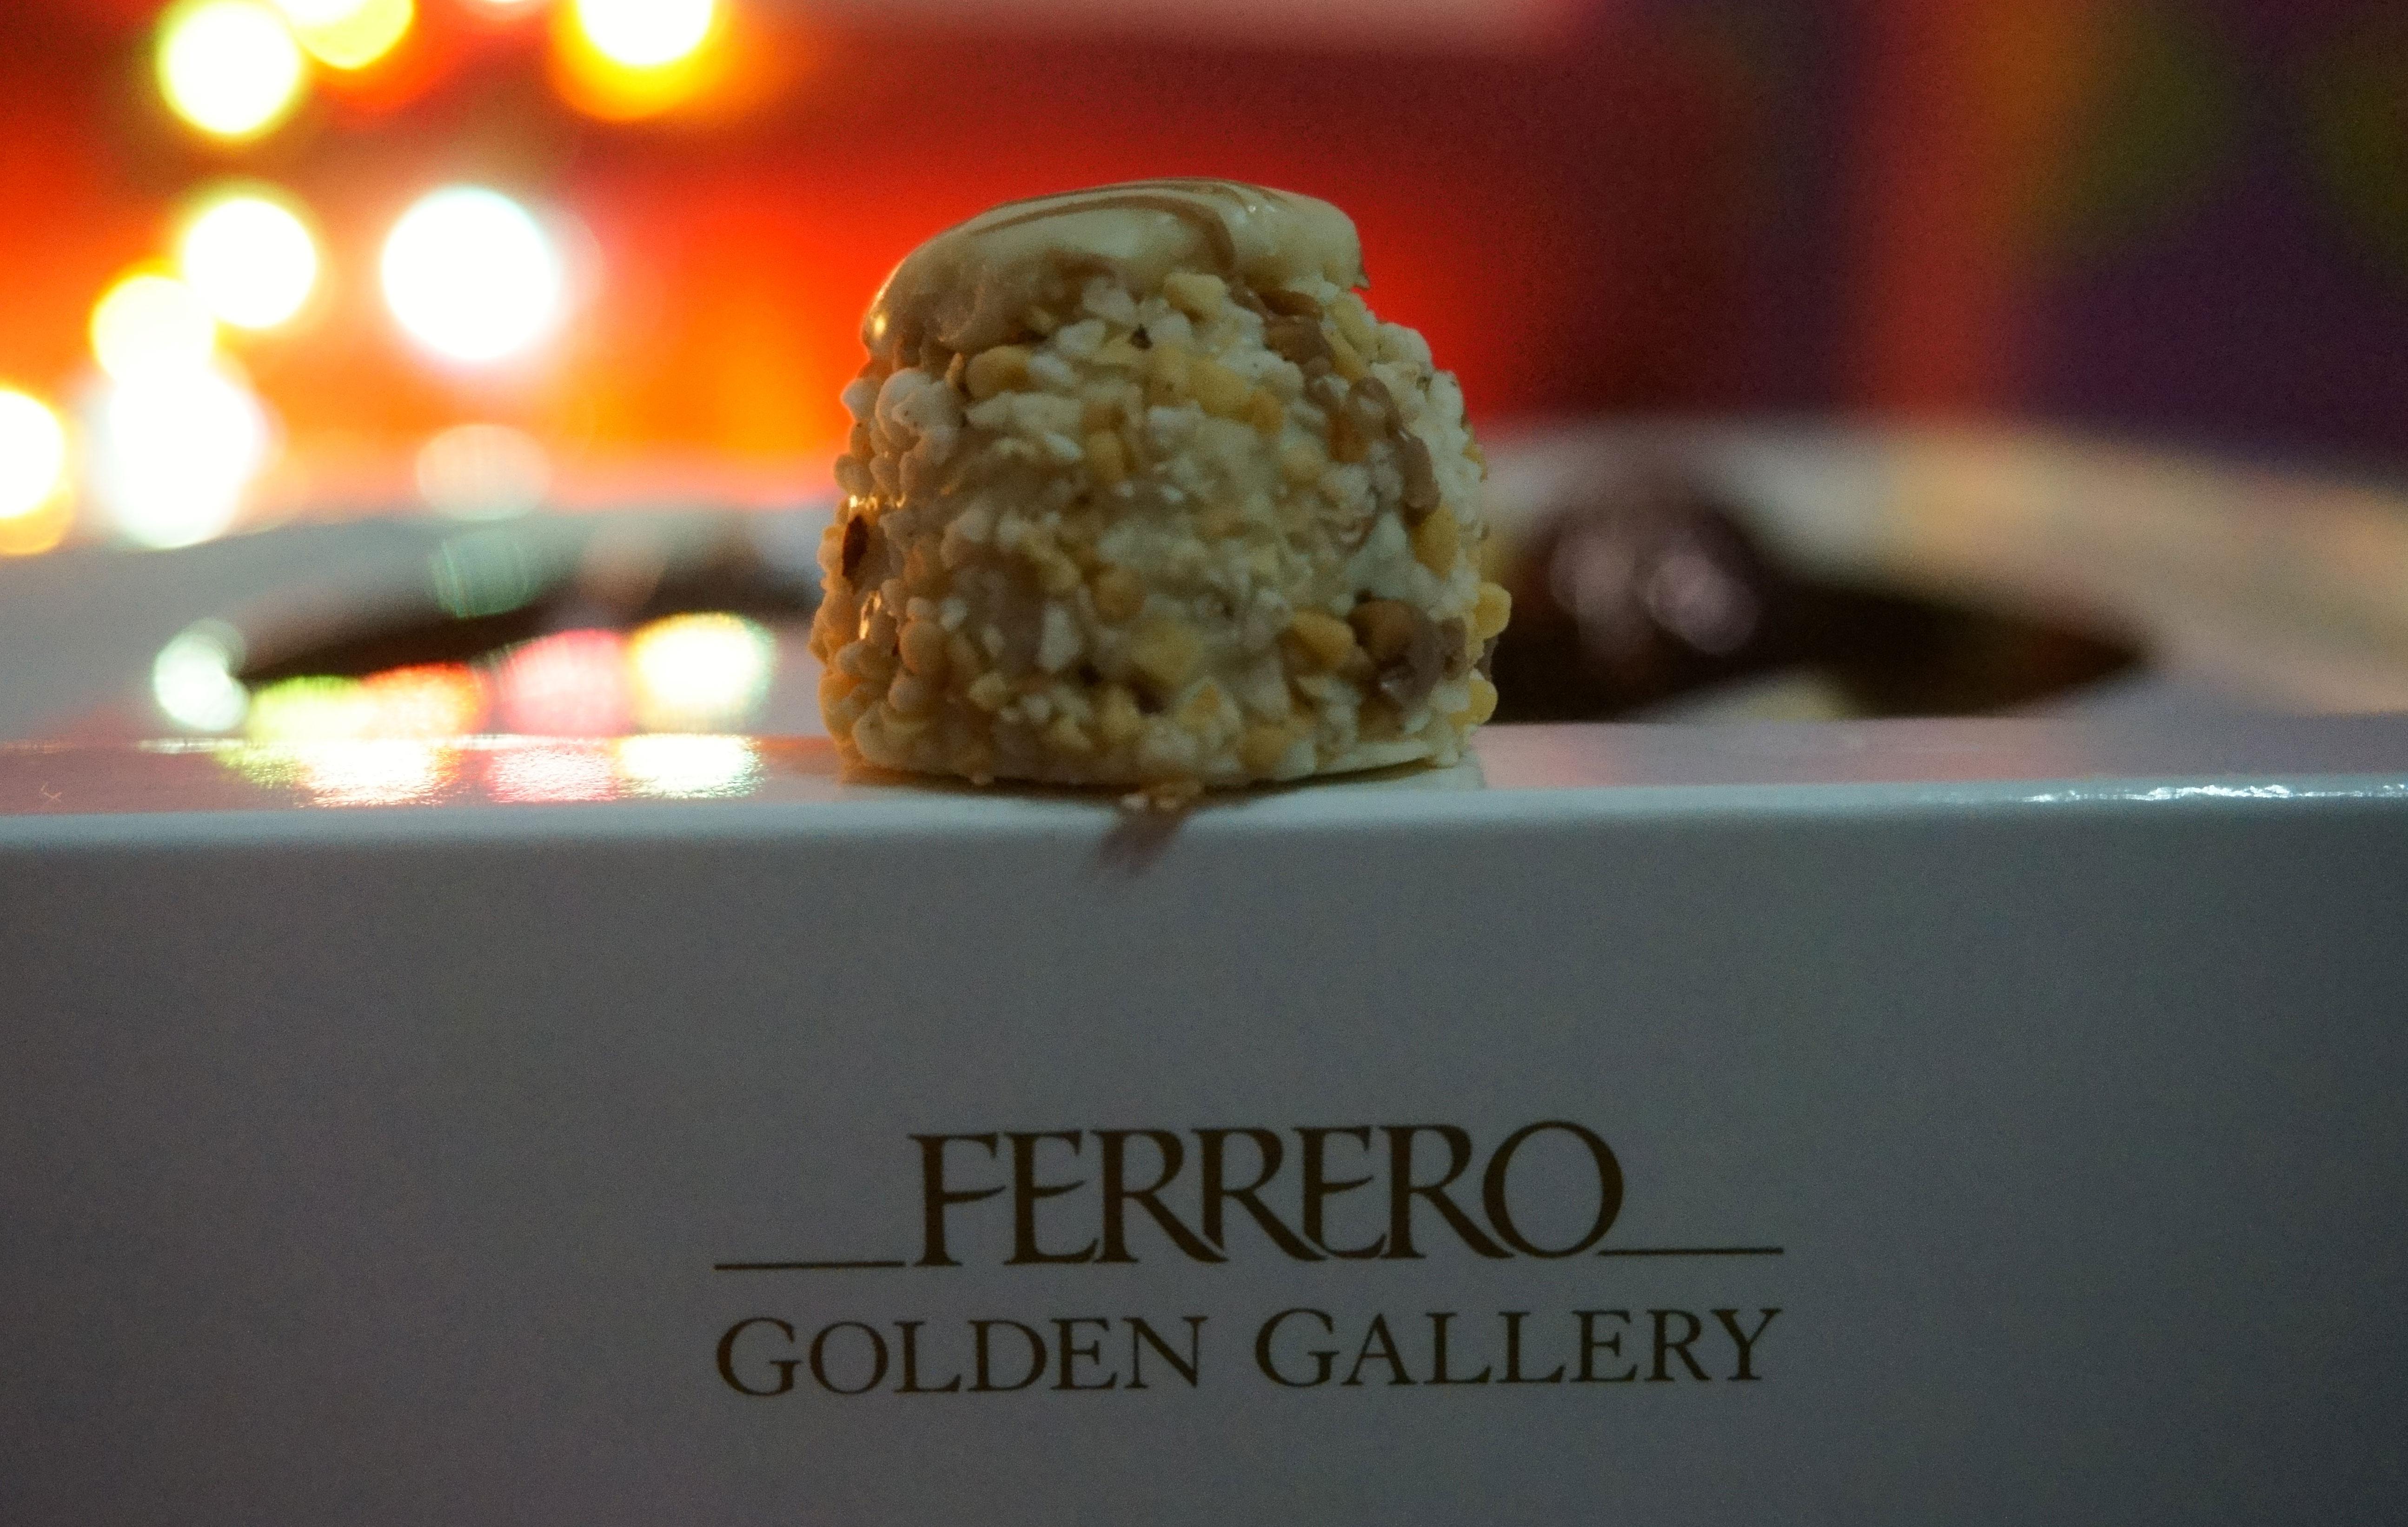 Ferrero Golden Gallery Ferrero Manderly